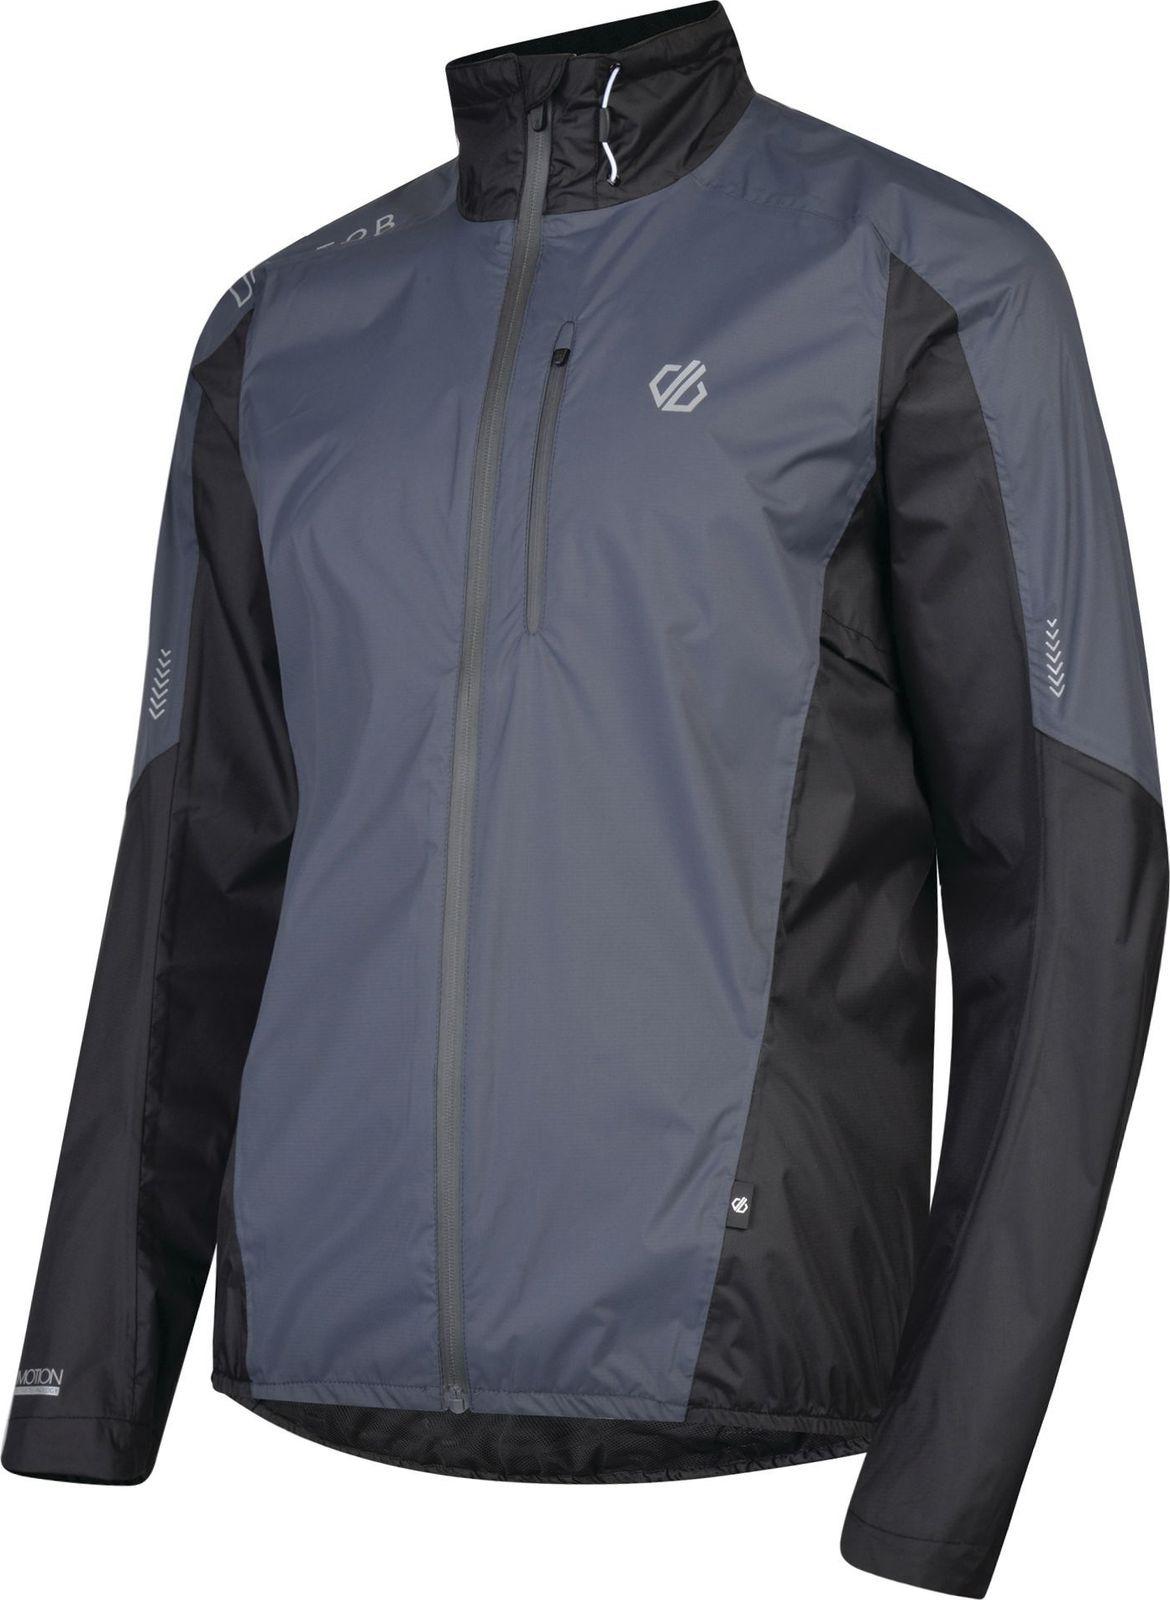 Велокуртка мужская Dare 2b Mediant Jacket, цвет: серый. DMW456-9QV. Размер L (52/54)